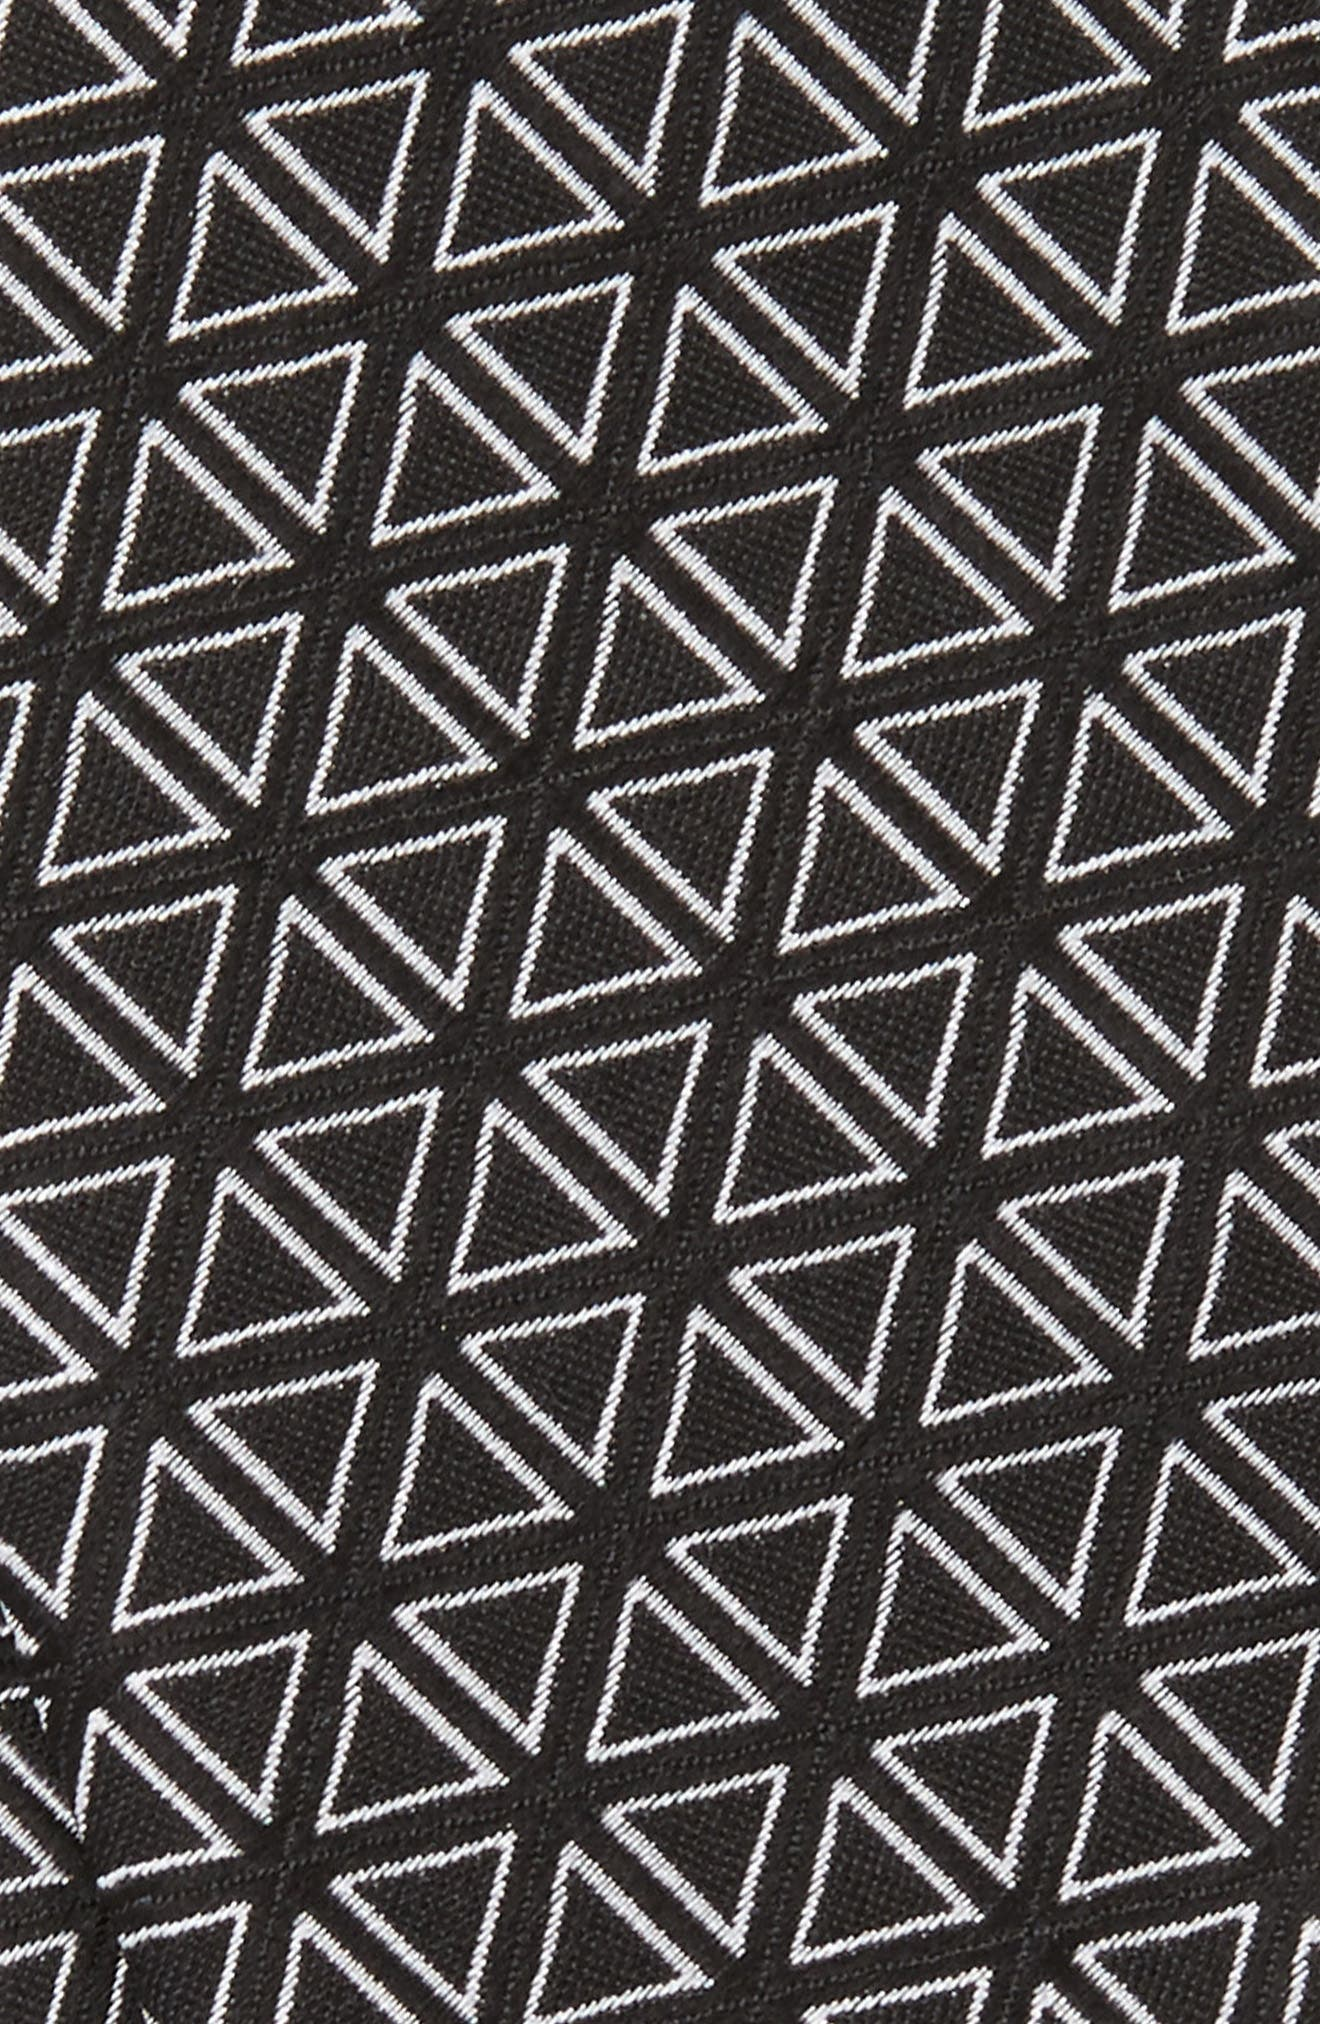 Triad Silk Bow Tie,                             Alternate thumbnail 3, color,                             001